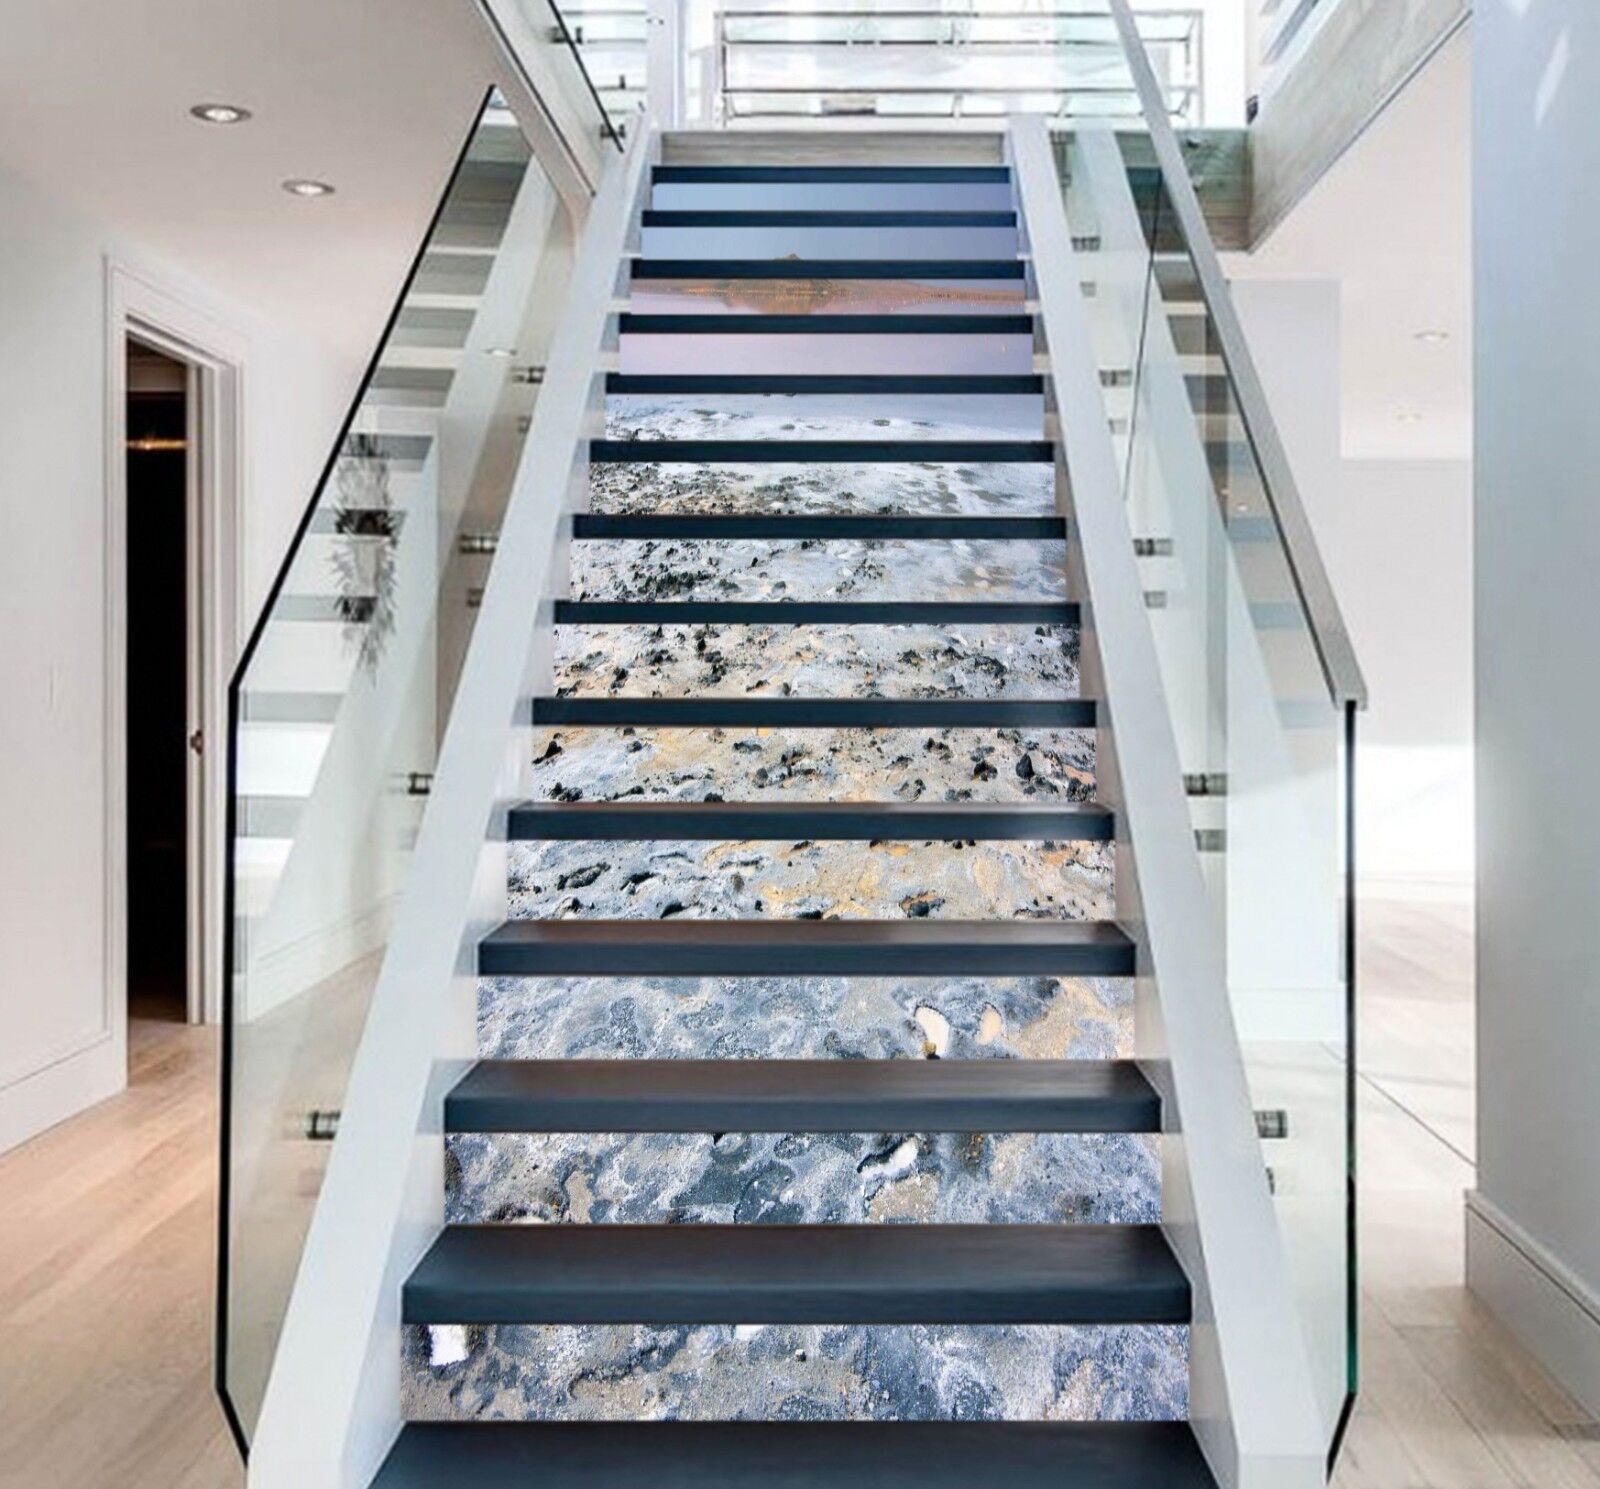 3D Snow sky 352 Stair Risers Decoration Photo Mural Vinyl Decal Wallpaper UK